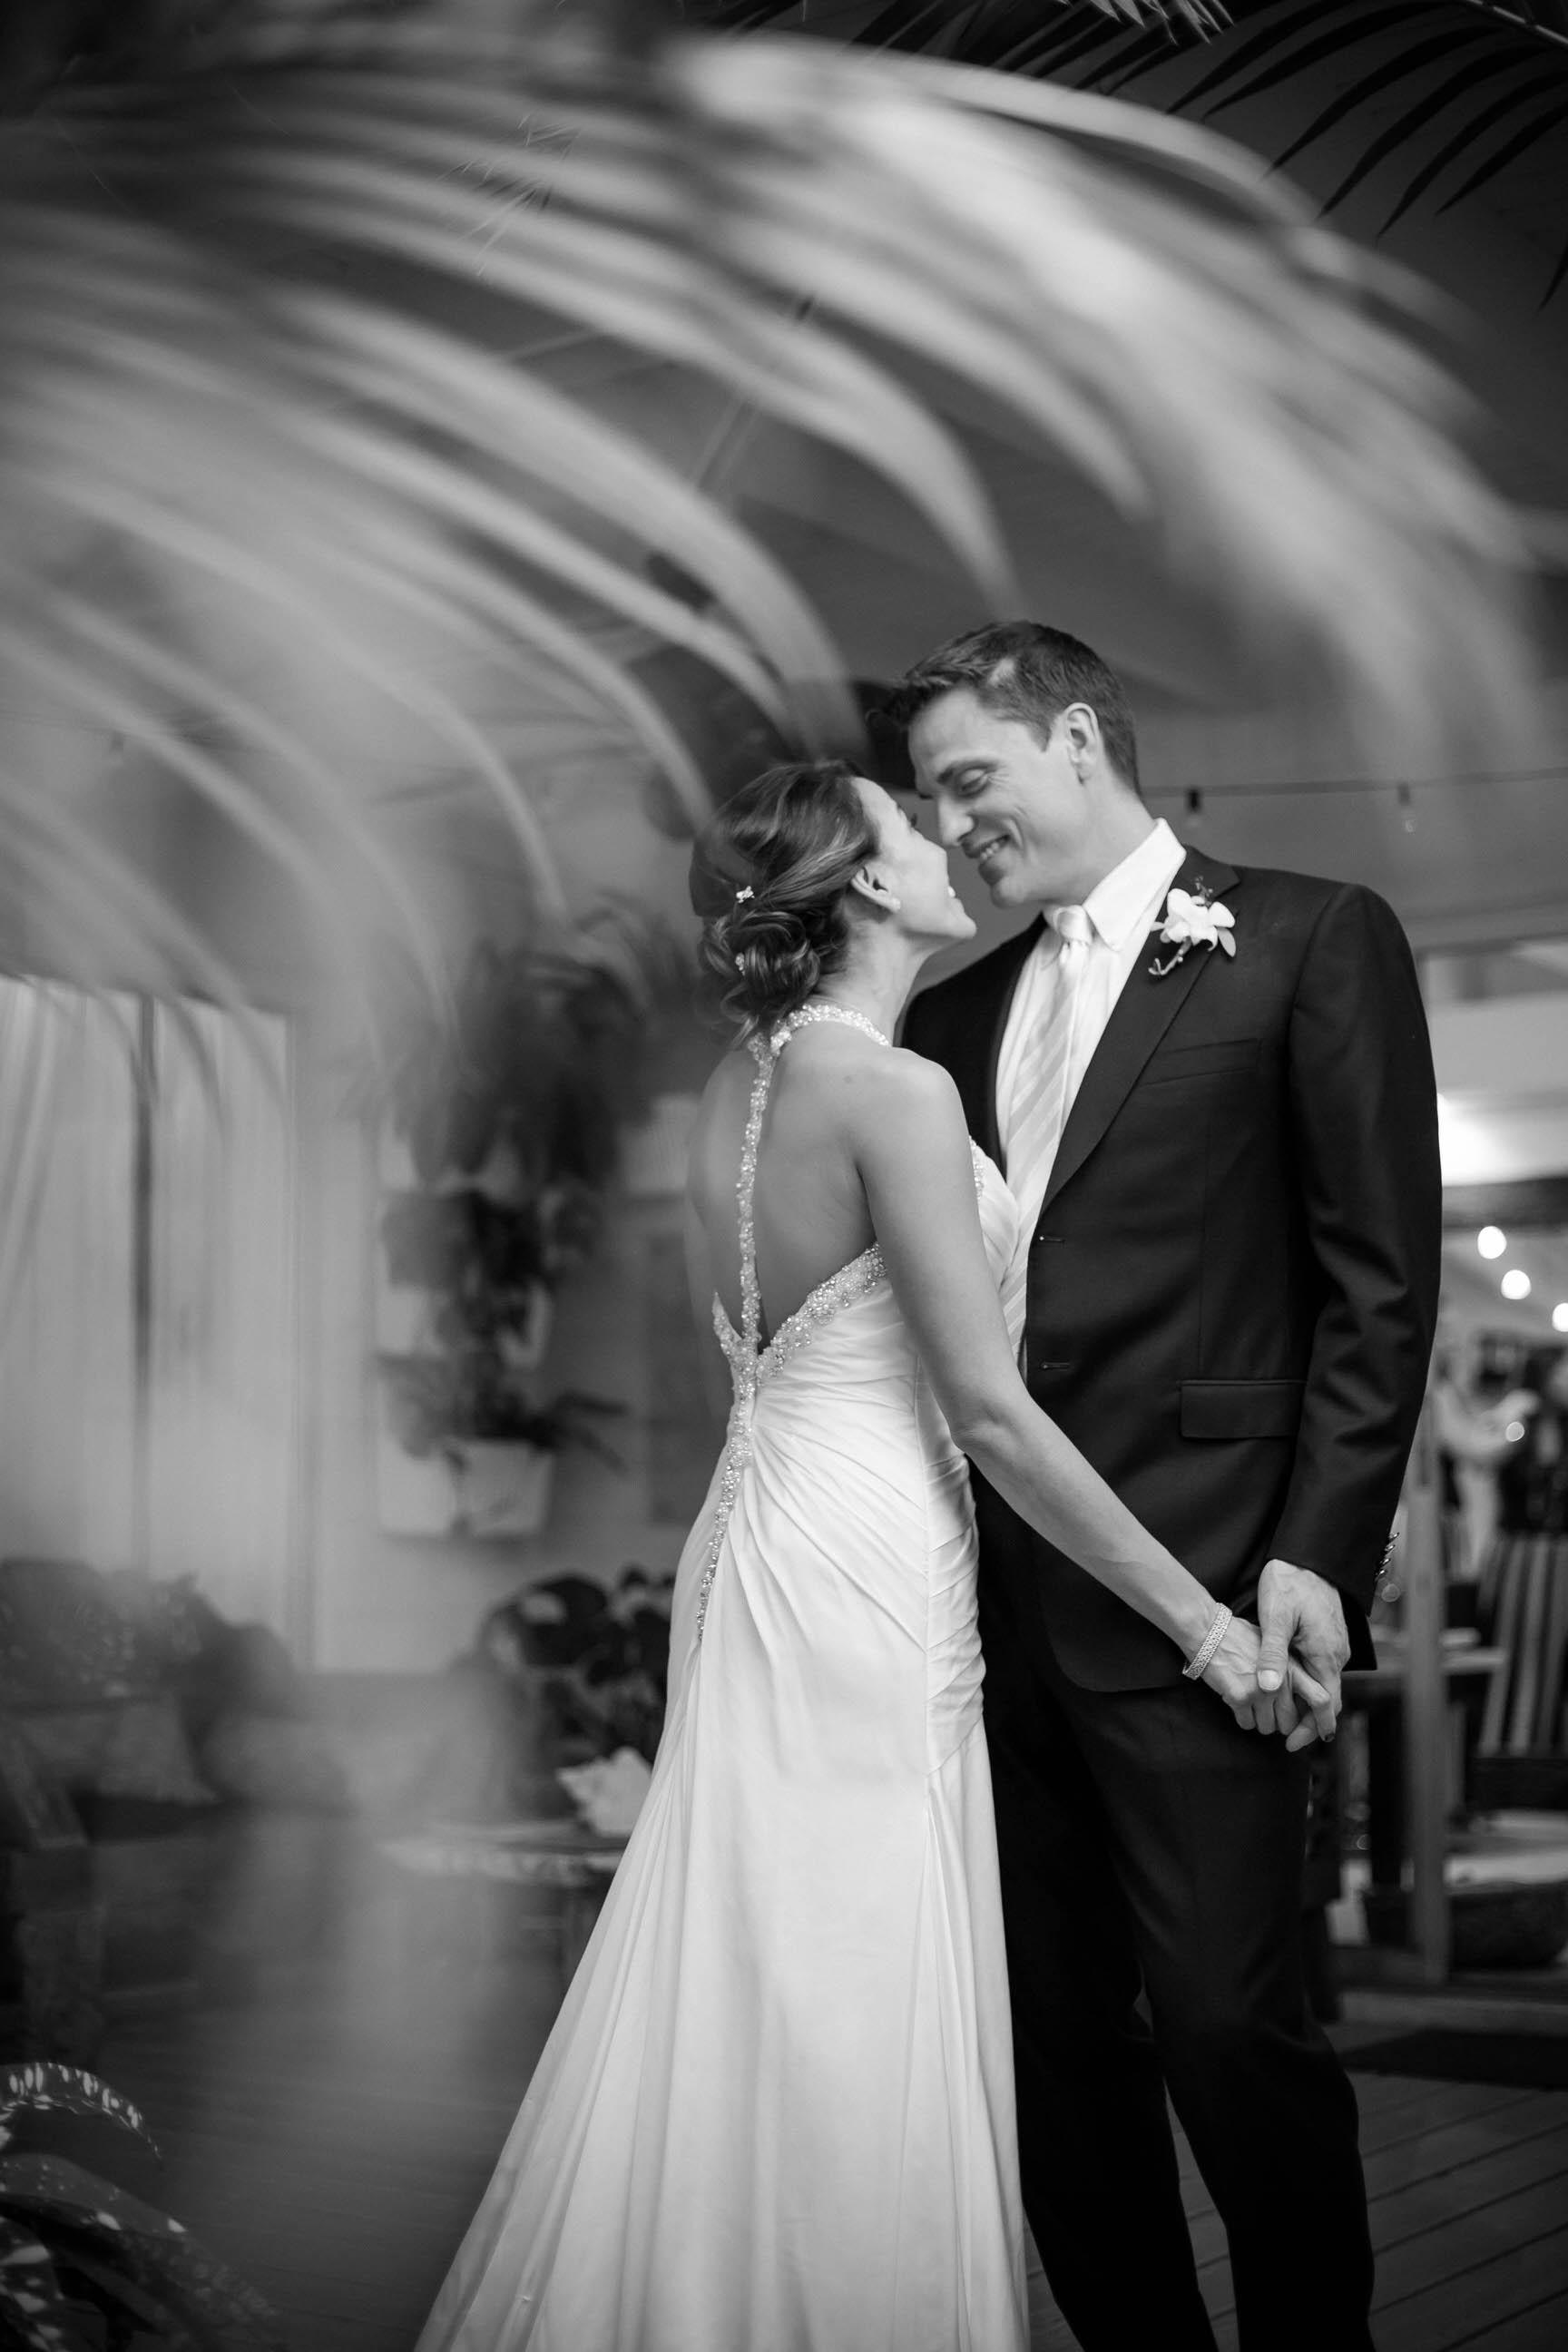 tiny_house_photo_black_and_white_wedding_photographer.jpg